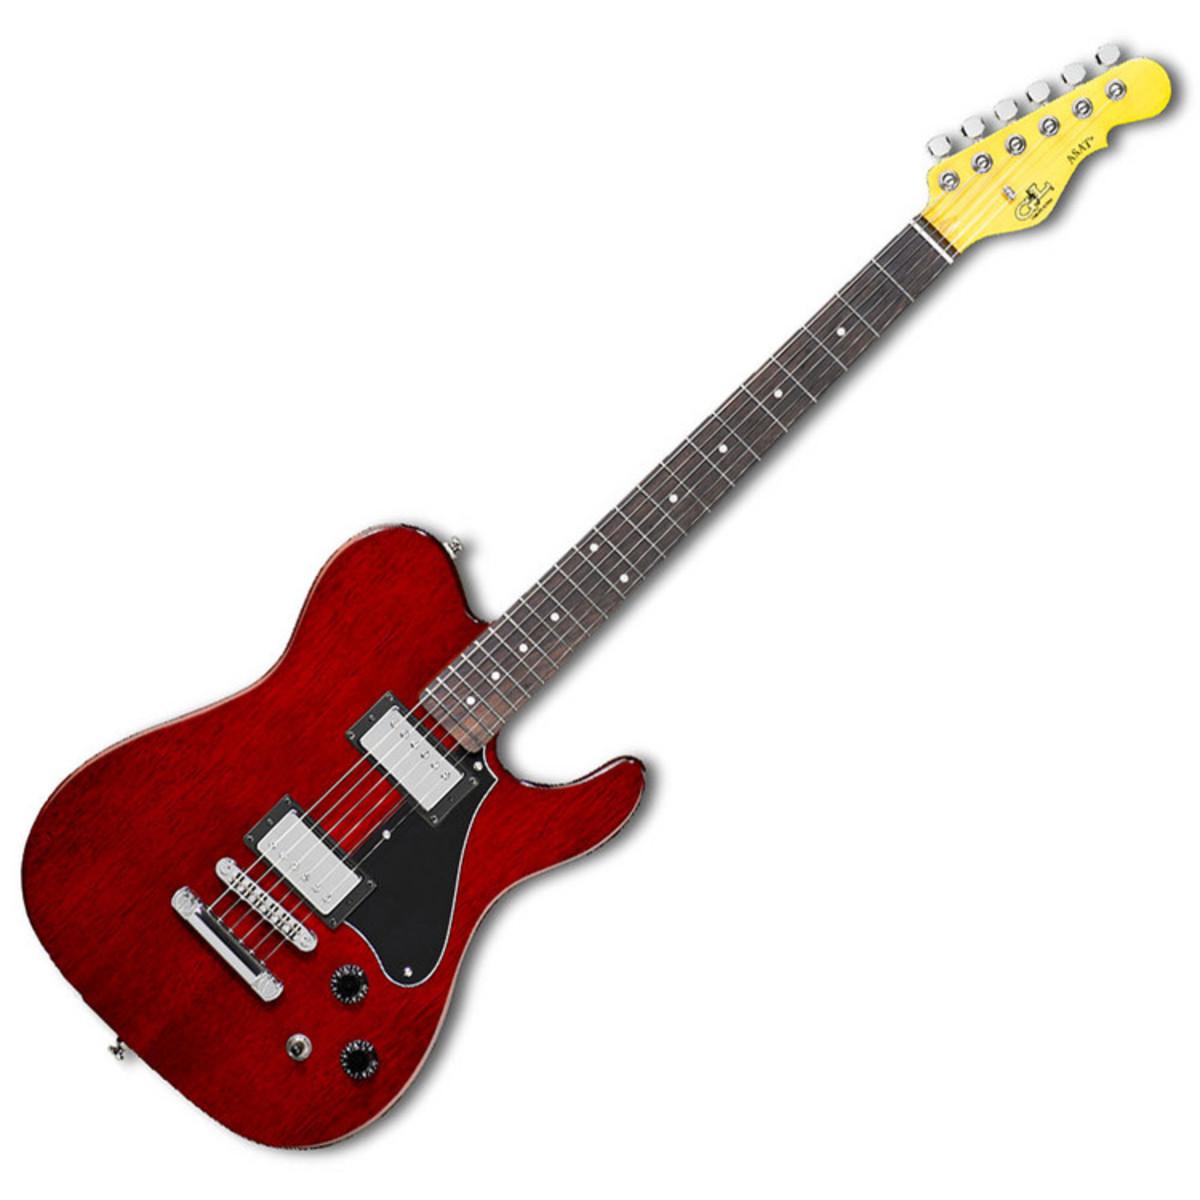 disc g l asat deluxe ii guitare lectrique rouge trans. Black Bedroom Furniture Sets. Home Design Ideas